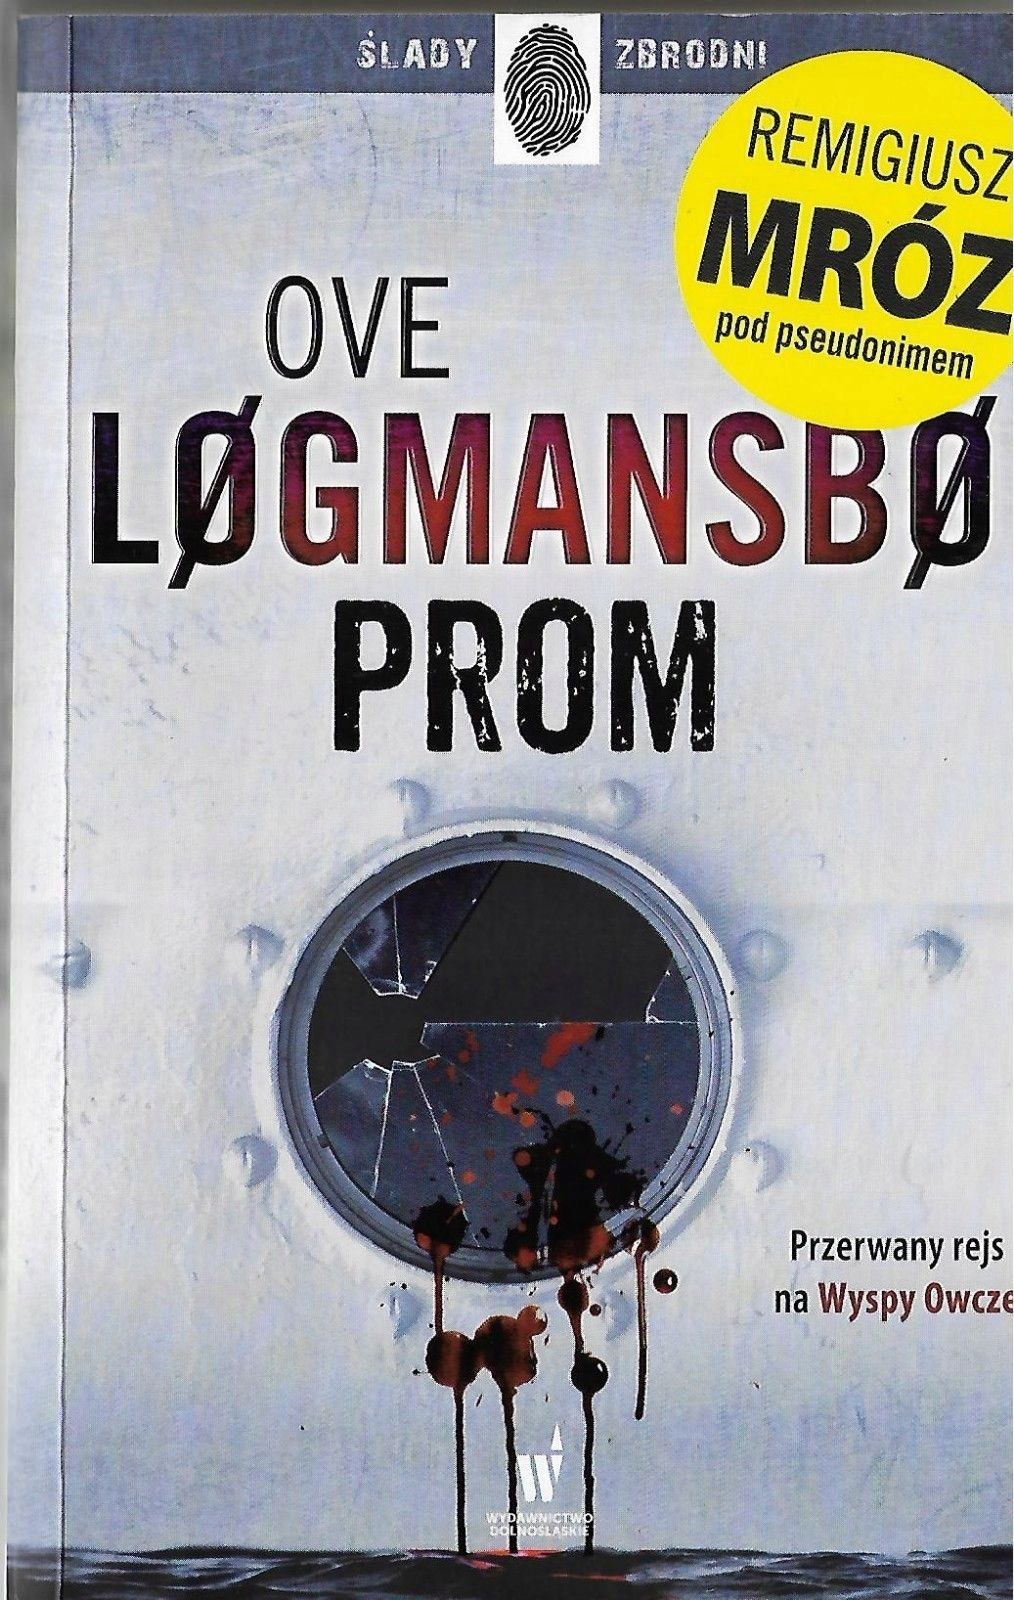 OVE LOGMANSBO / REMIGIUSZ MRÓZ / PROM /2017